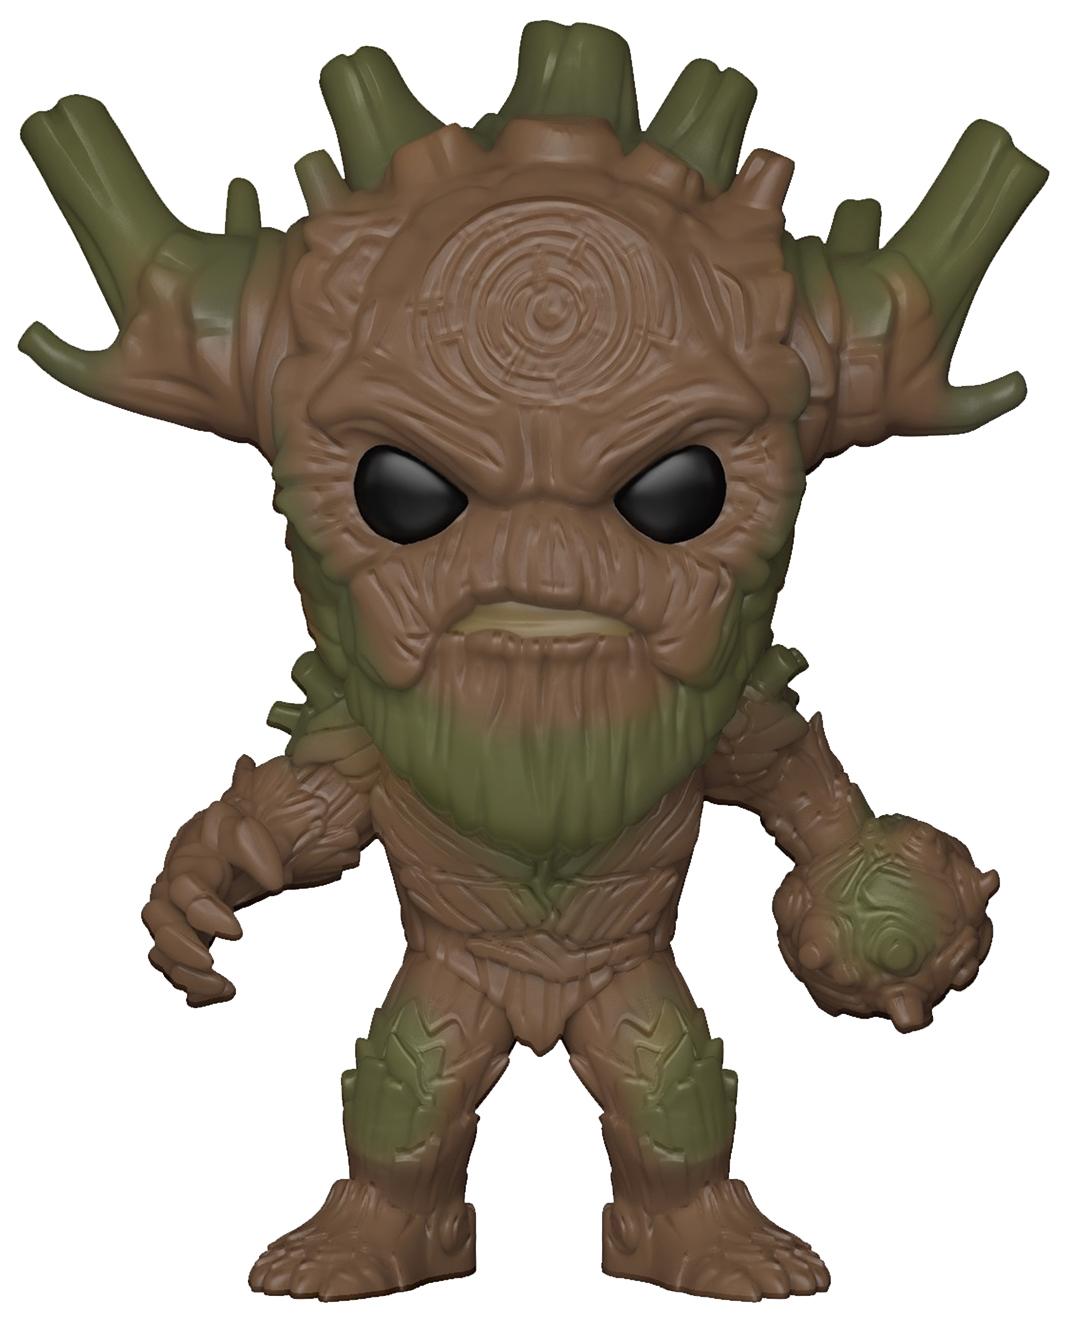 Фигурка Funko POP! Games: Contest of Champions: King Groot